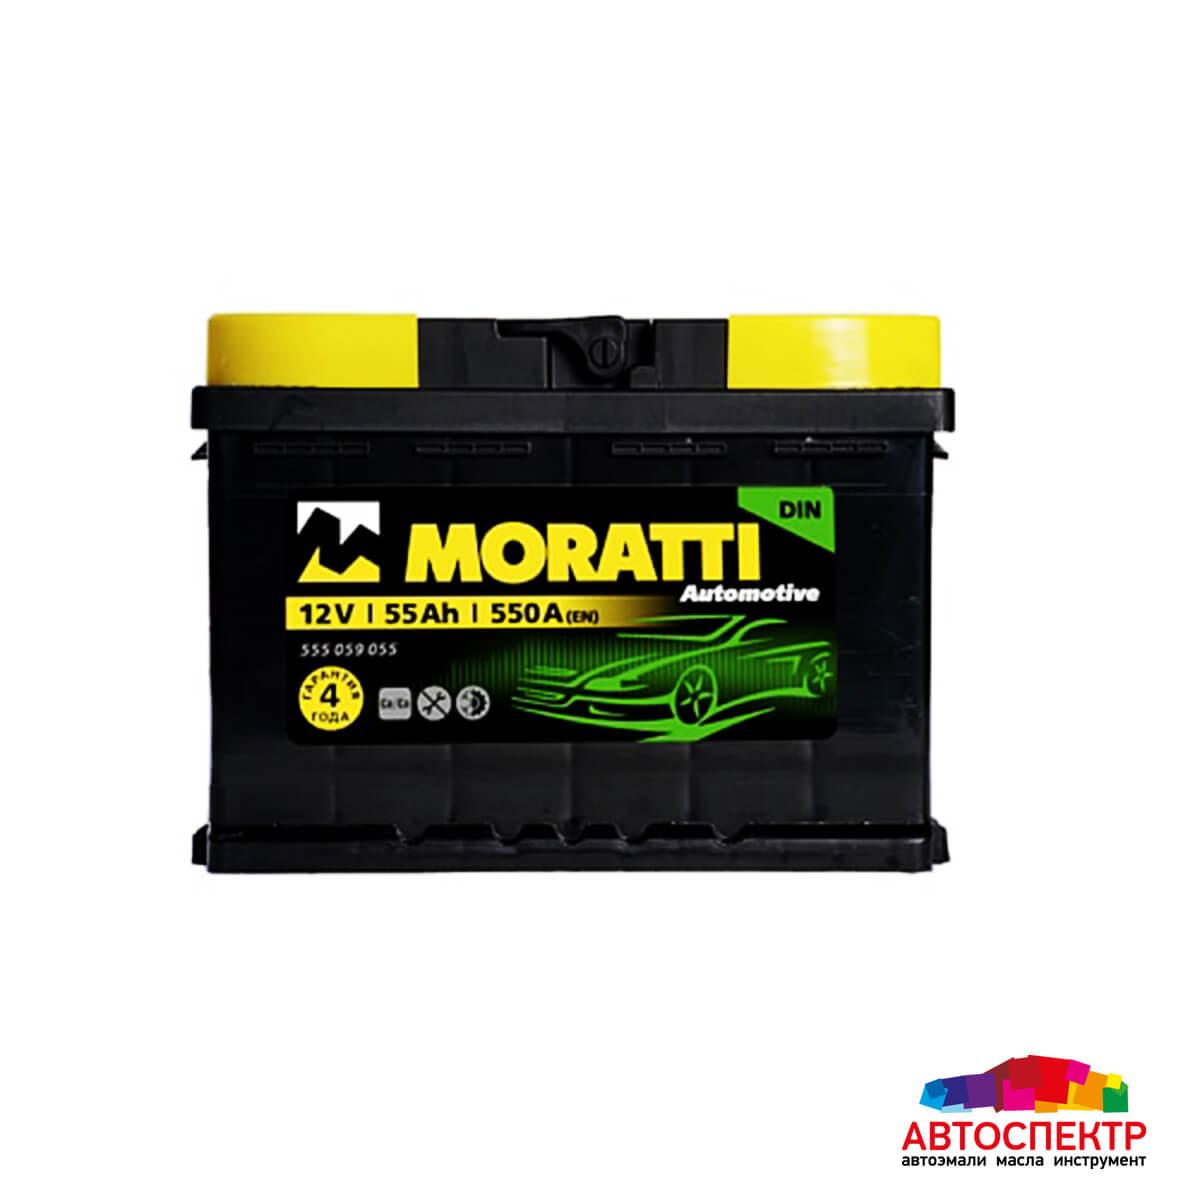 MORATTI Аккумуляторная батарея автомобильная  55 A/h обратная полярность